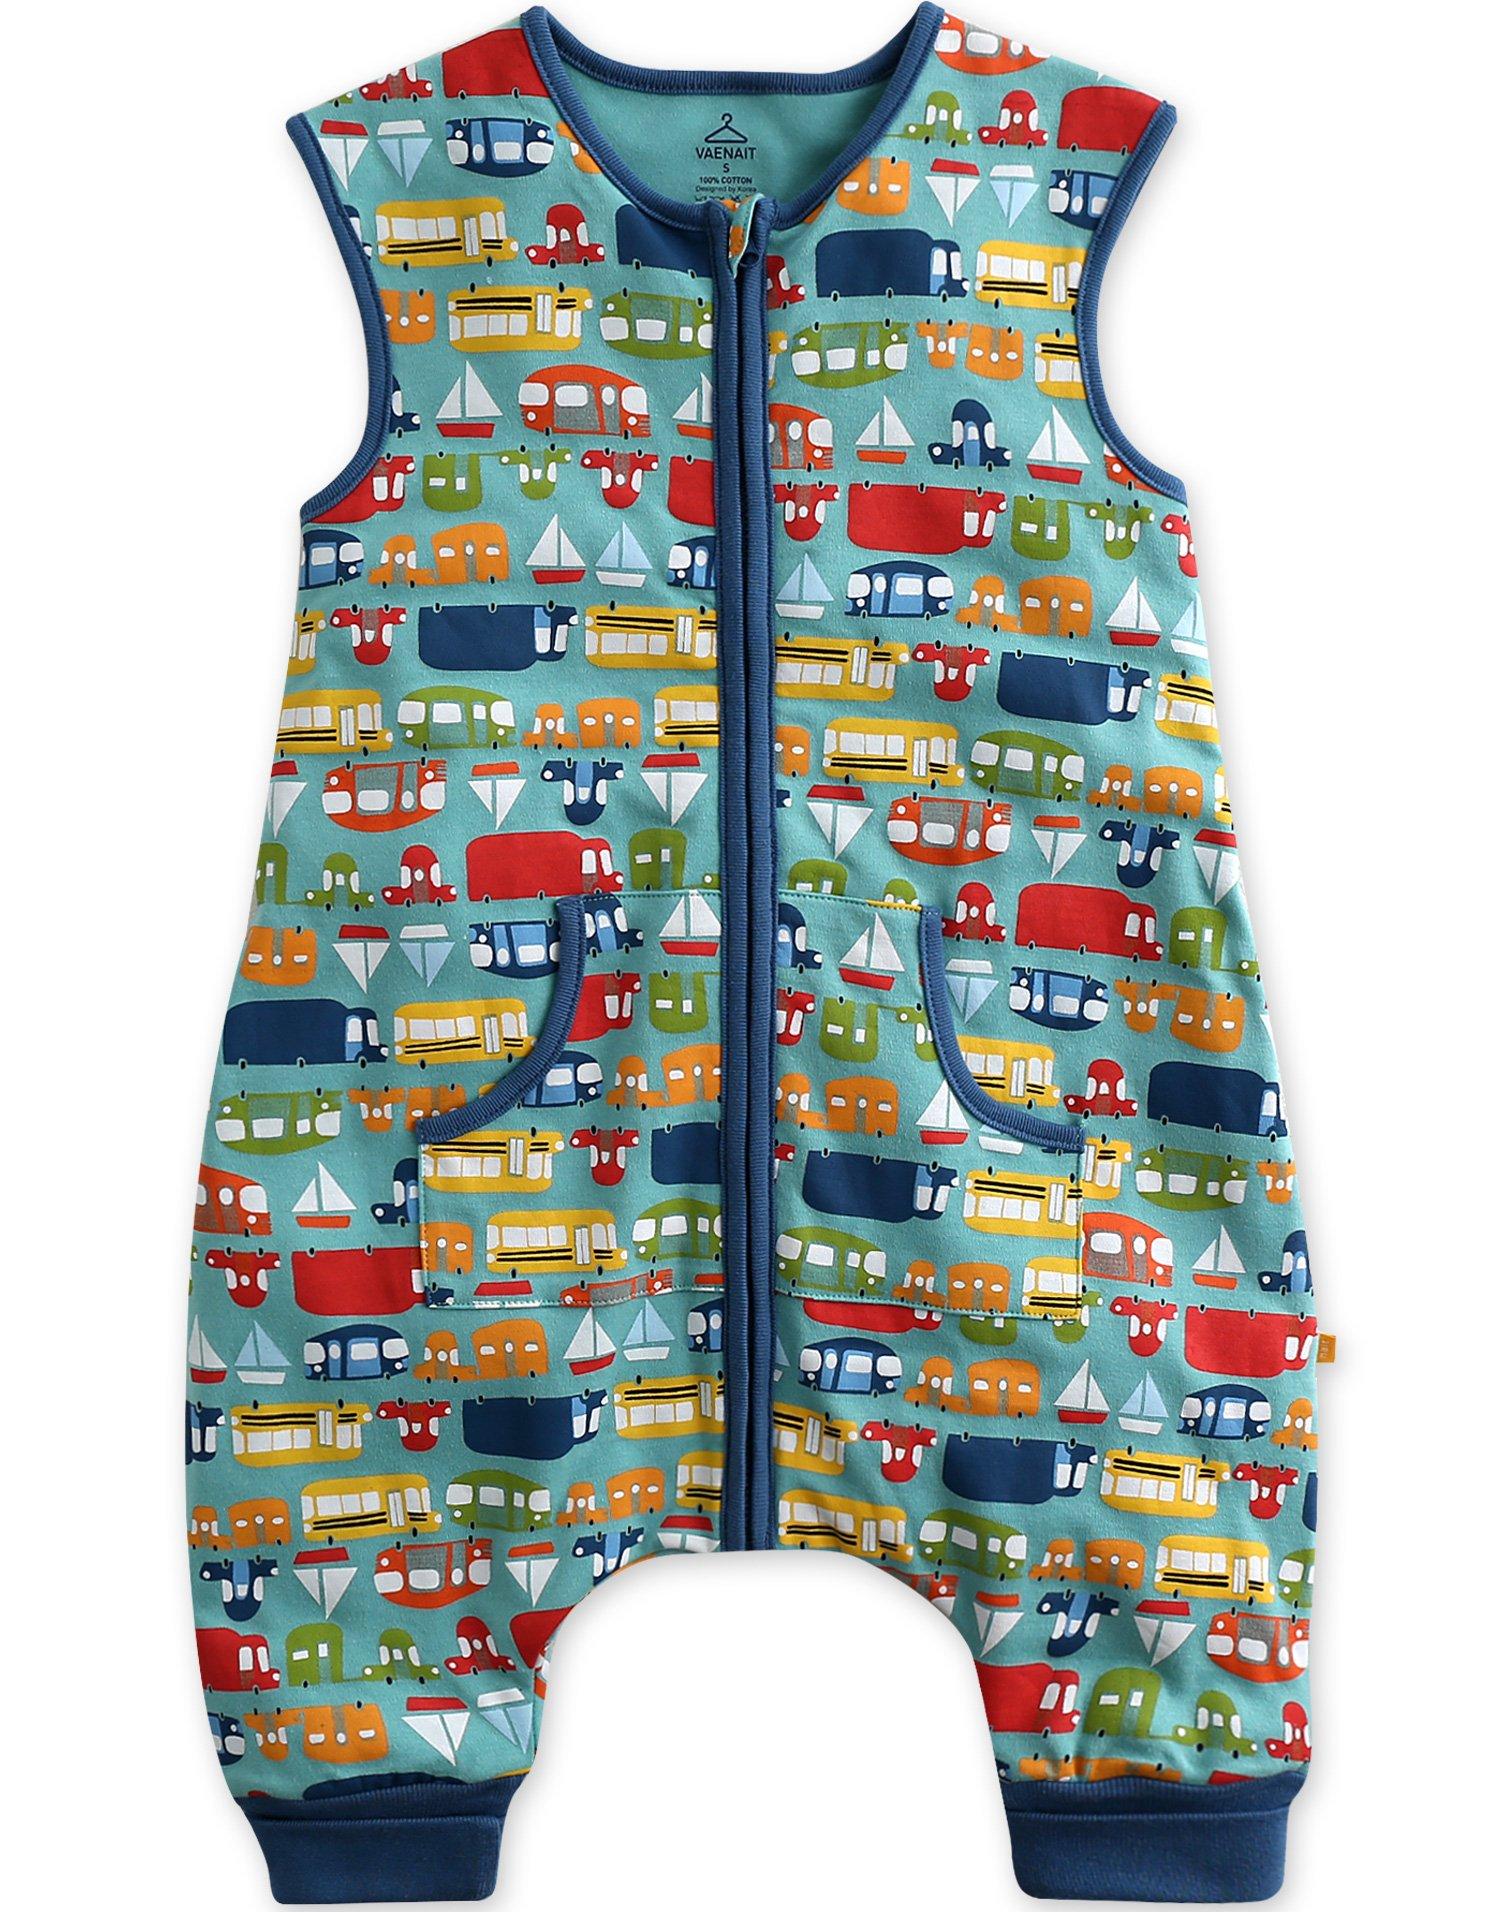 Vaenait Baby Kids Boys Double-Layered Cotton Wearable Blanket Sleeper Sleep Travel M